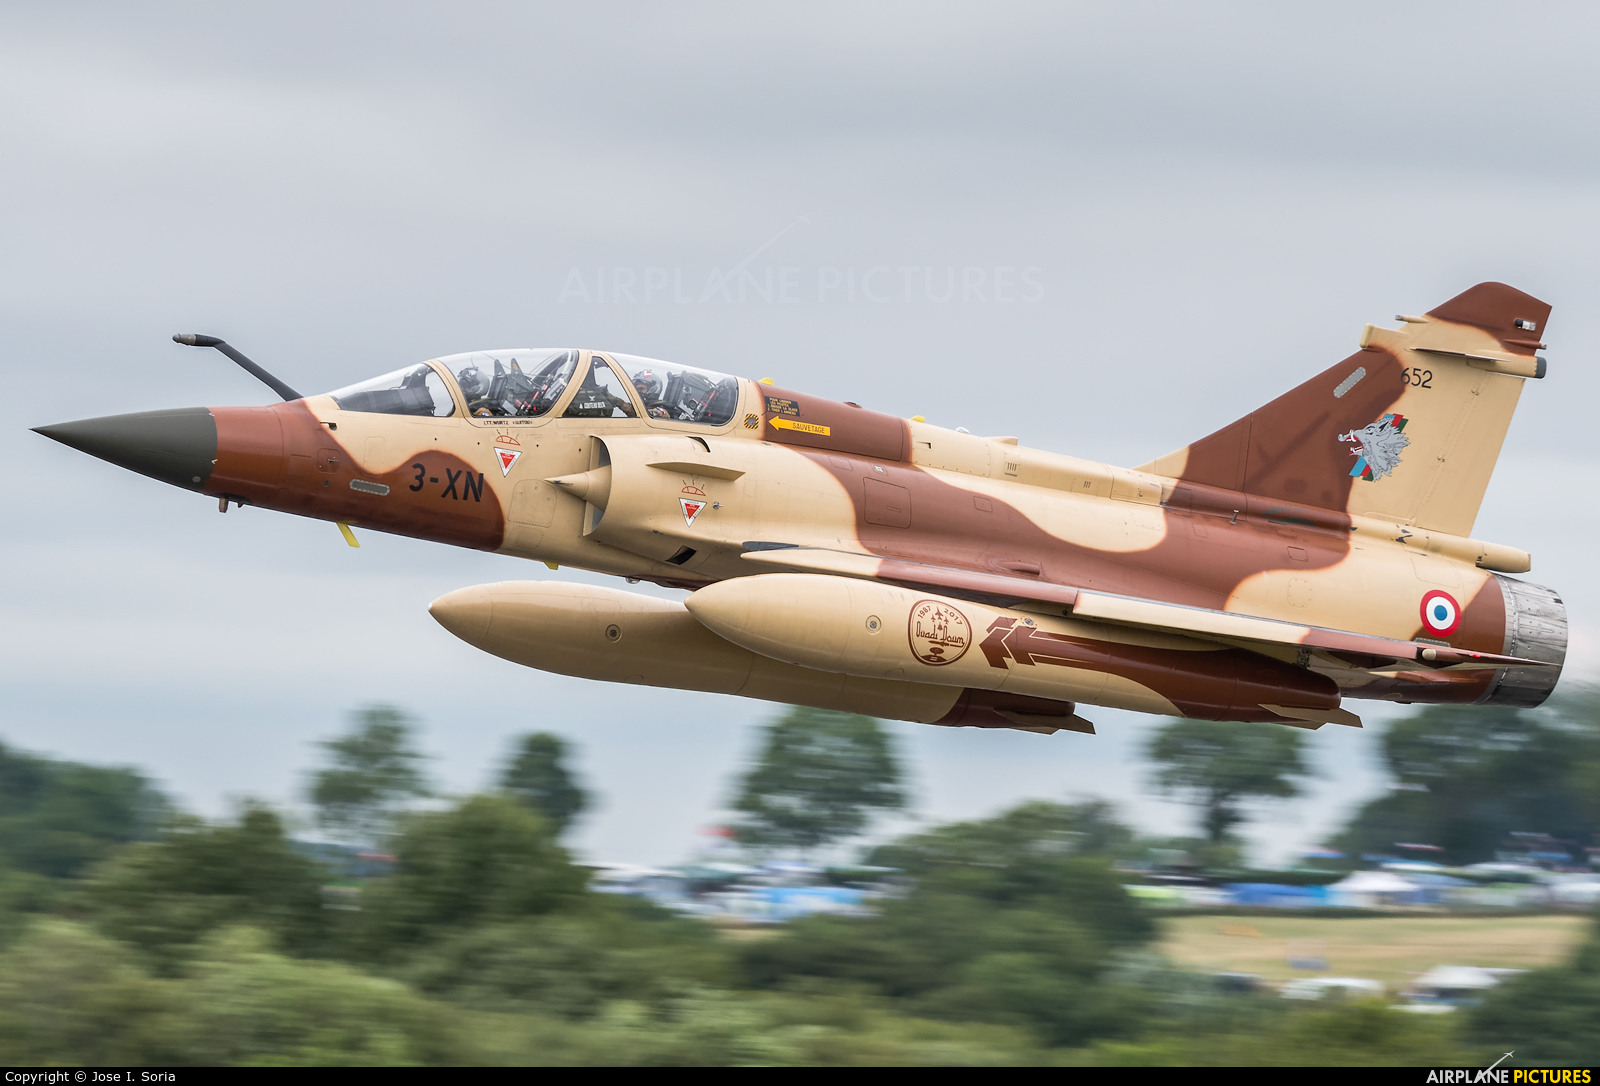 France - Air Force 652 aircraft at Fairford